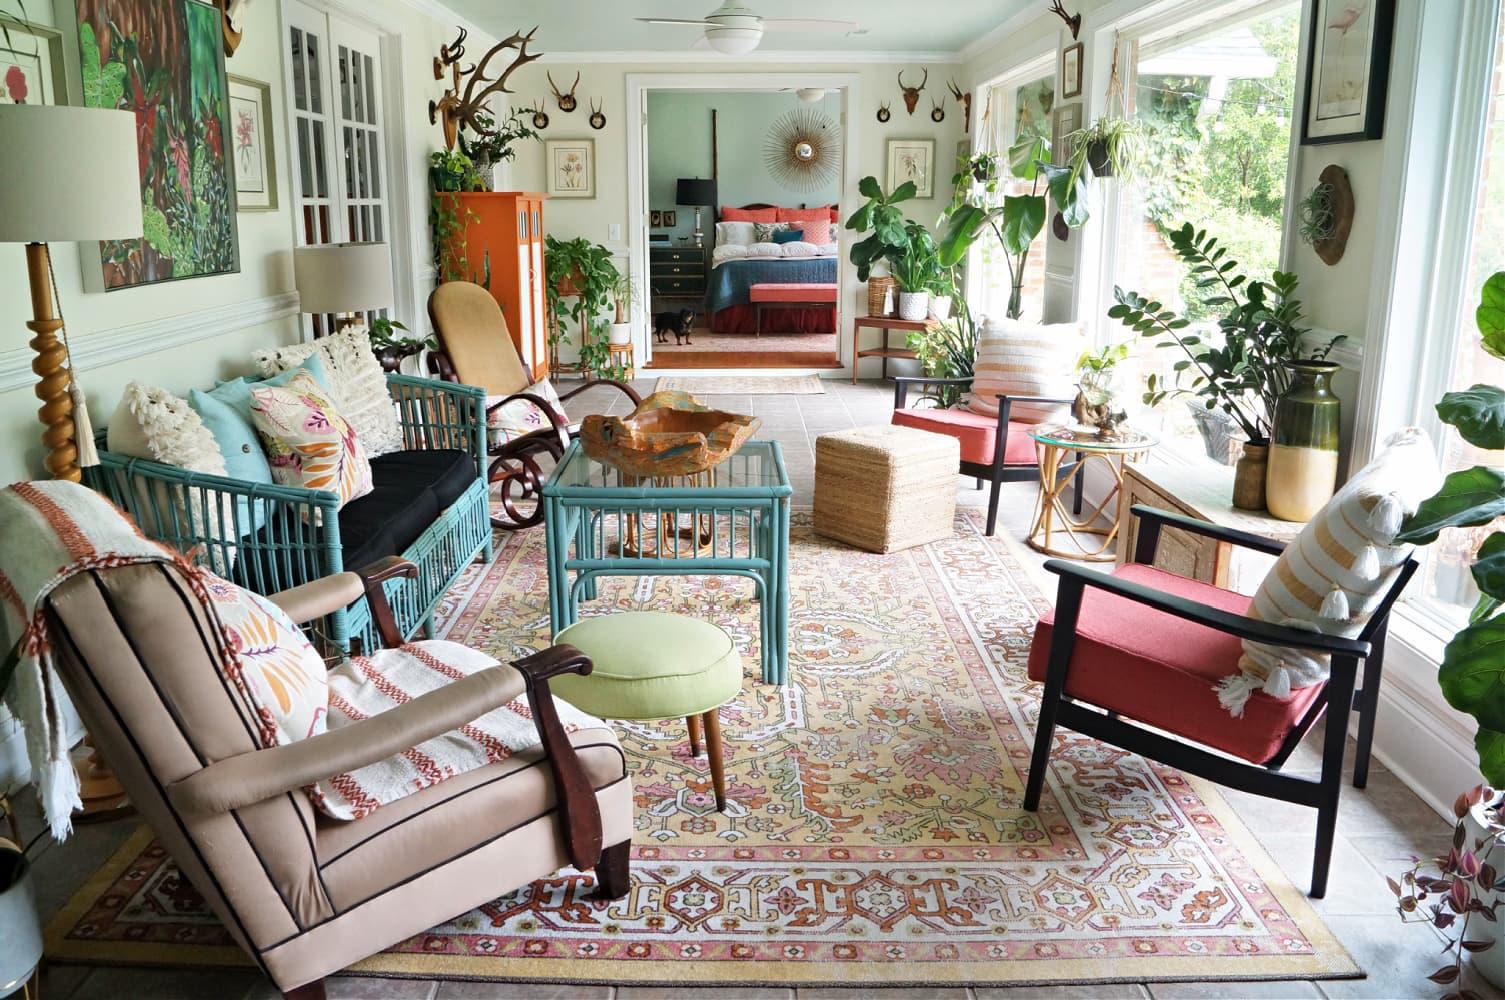 sunroom-boho-coral-green-yellow-blue-ceiling-plants-bohemian-porch-greenhouse-sunny-houseplants